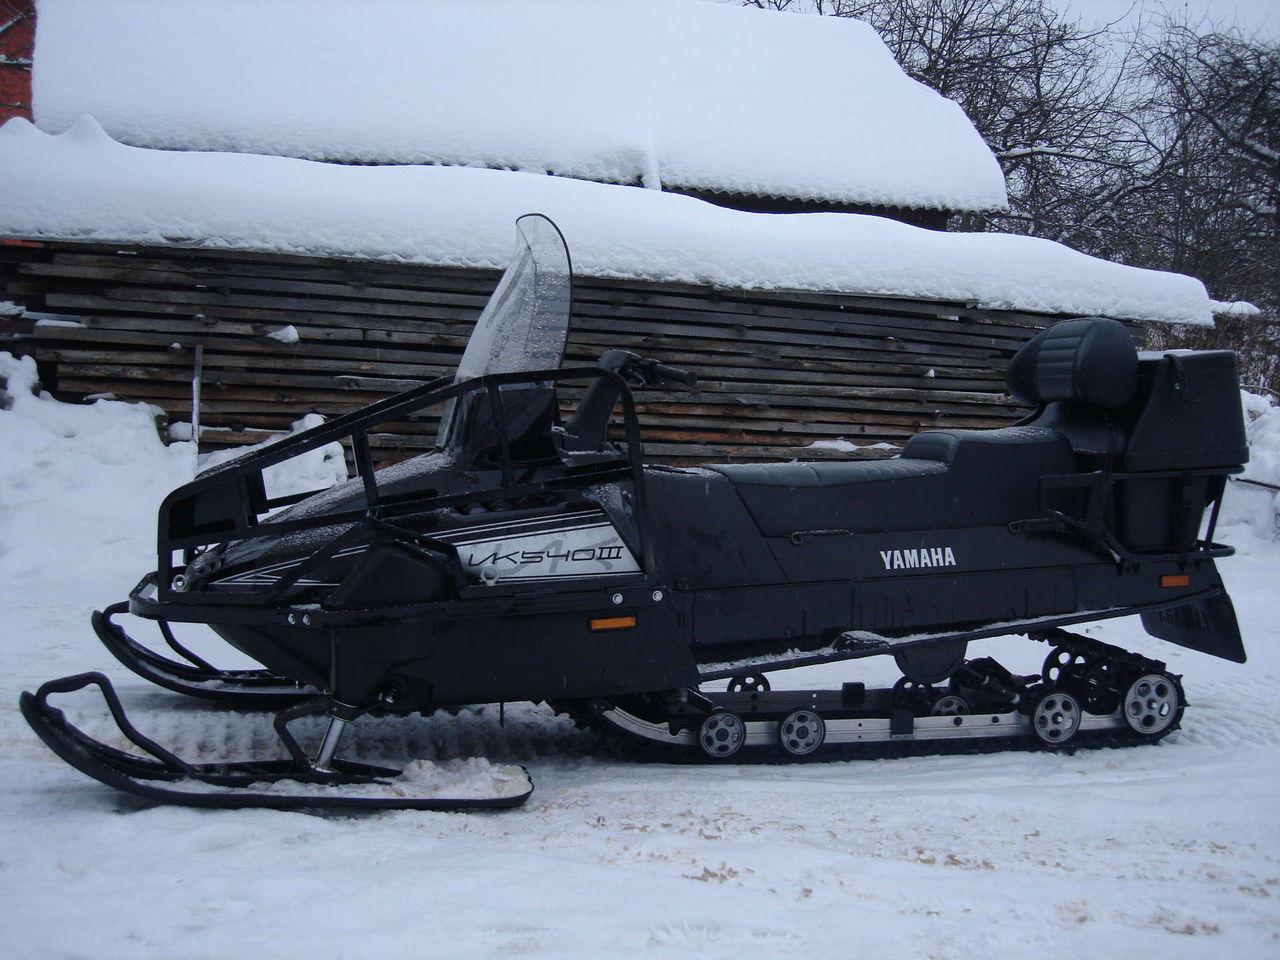 Бампер на снегоход своими руками 6